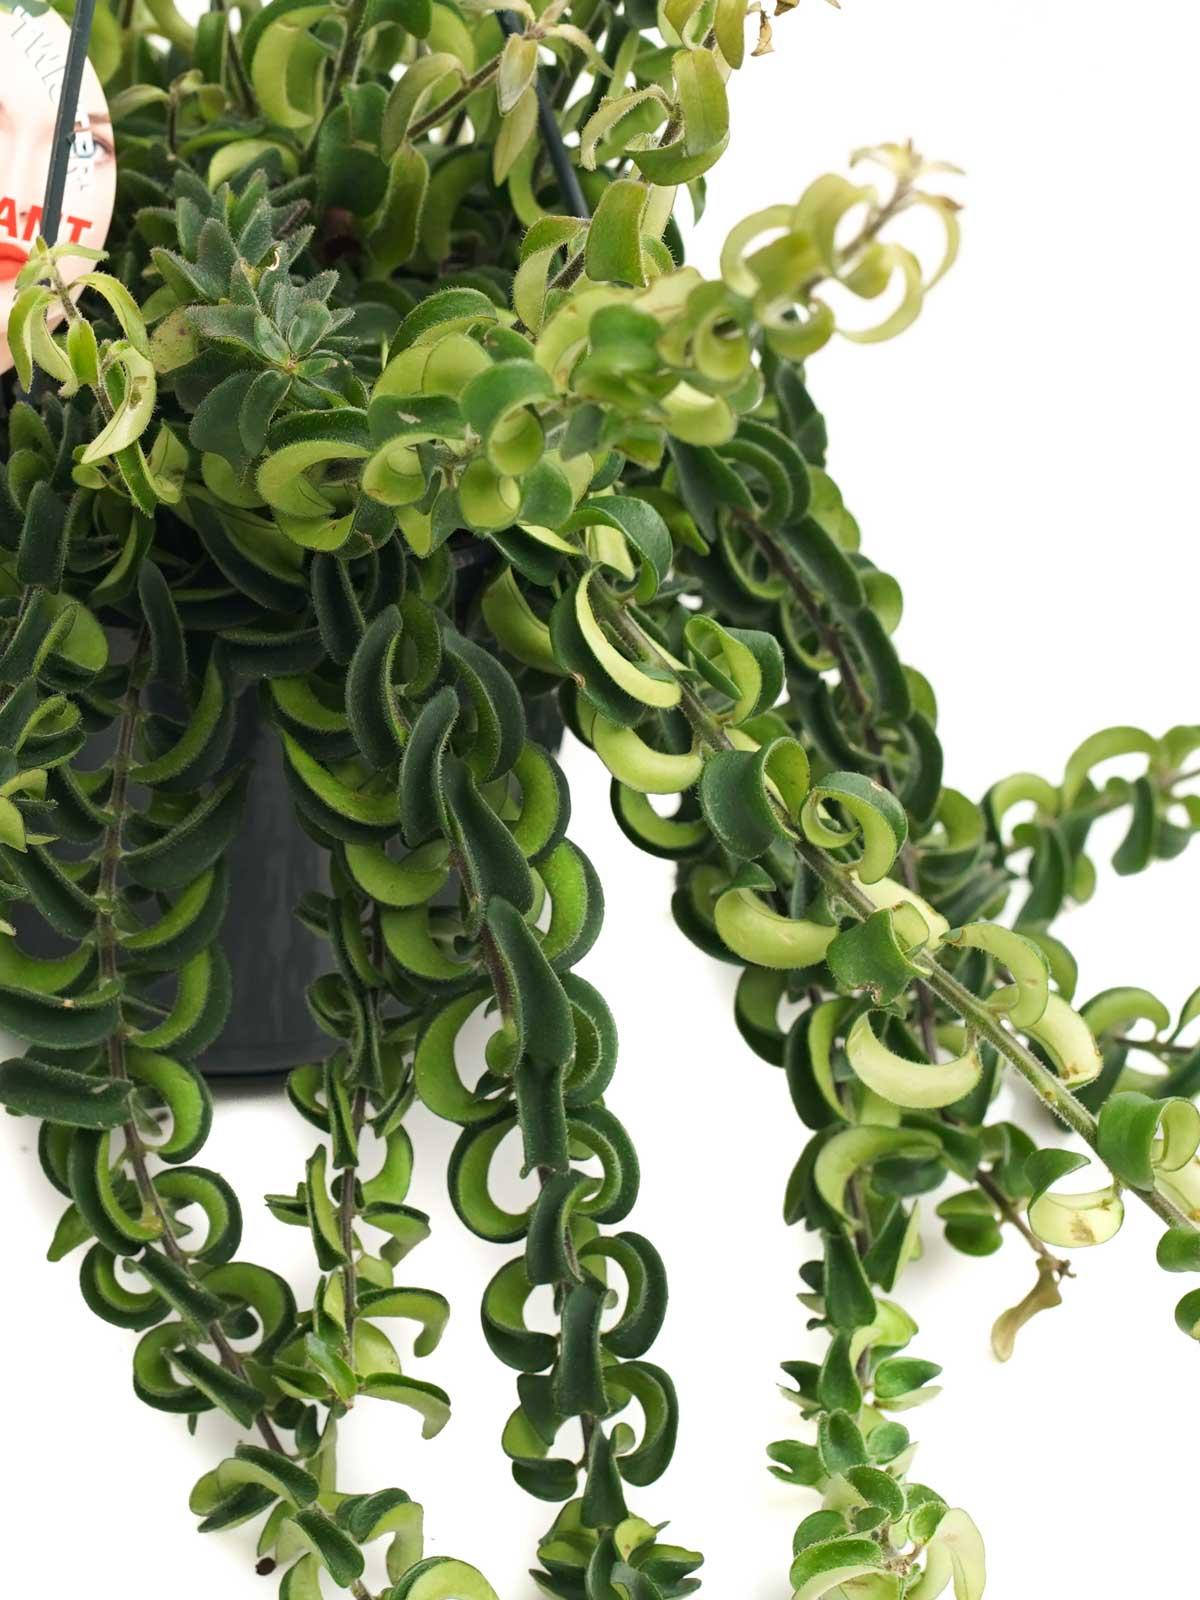 Aeschynanthus MonaLisa Curly 'Indoor Plants Hanging